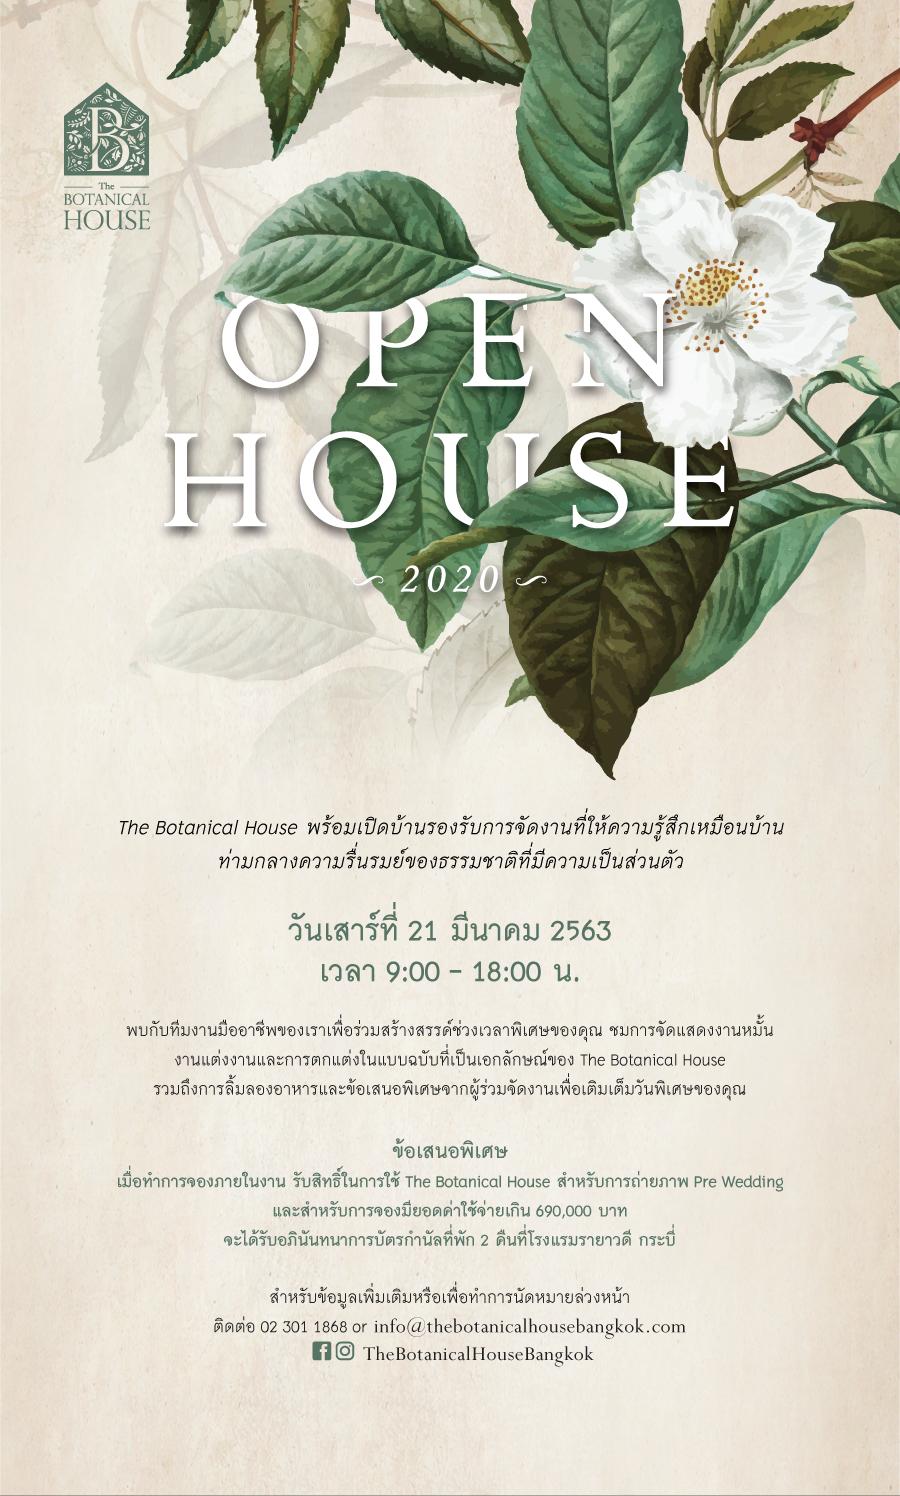 undefined แค่จองภายในงาน Wedding Showcase @The Botanical House รับสิทธิ์ถ่าย Pre-wedding ไปเลยฟรี!